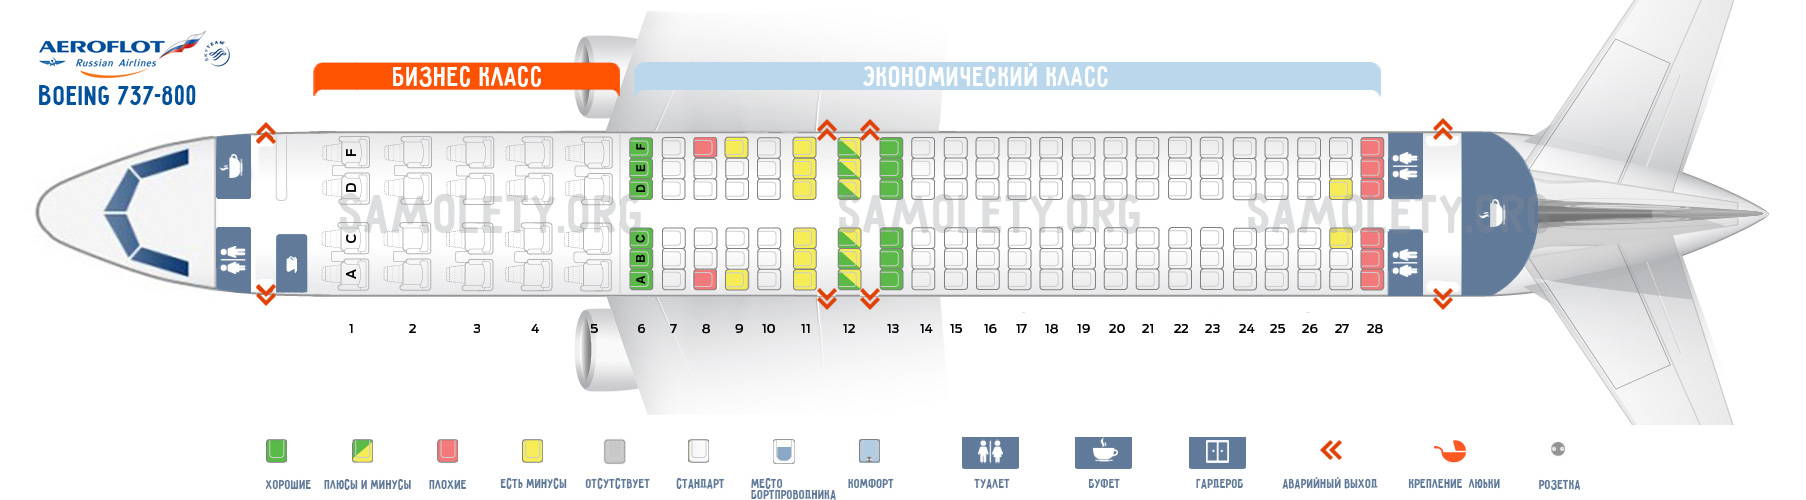 Боинг 737 800 схема салона лучшие места